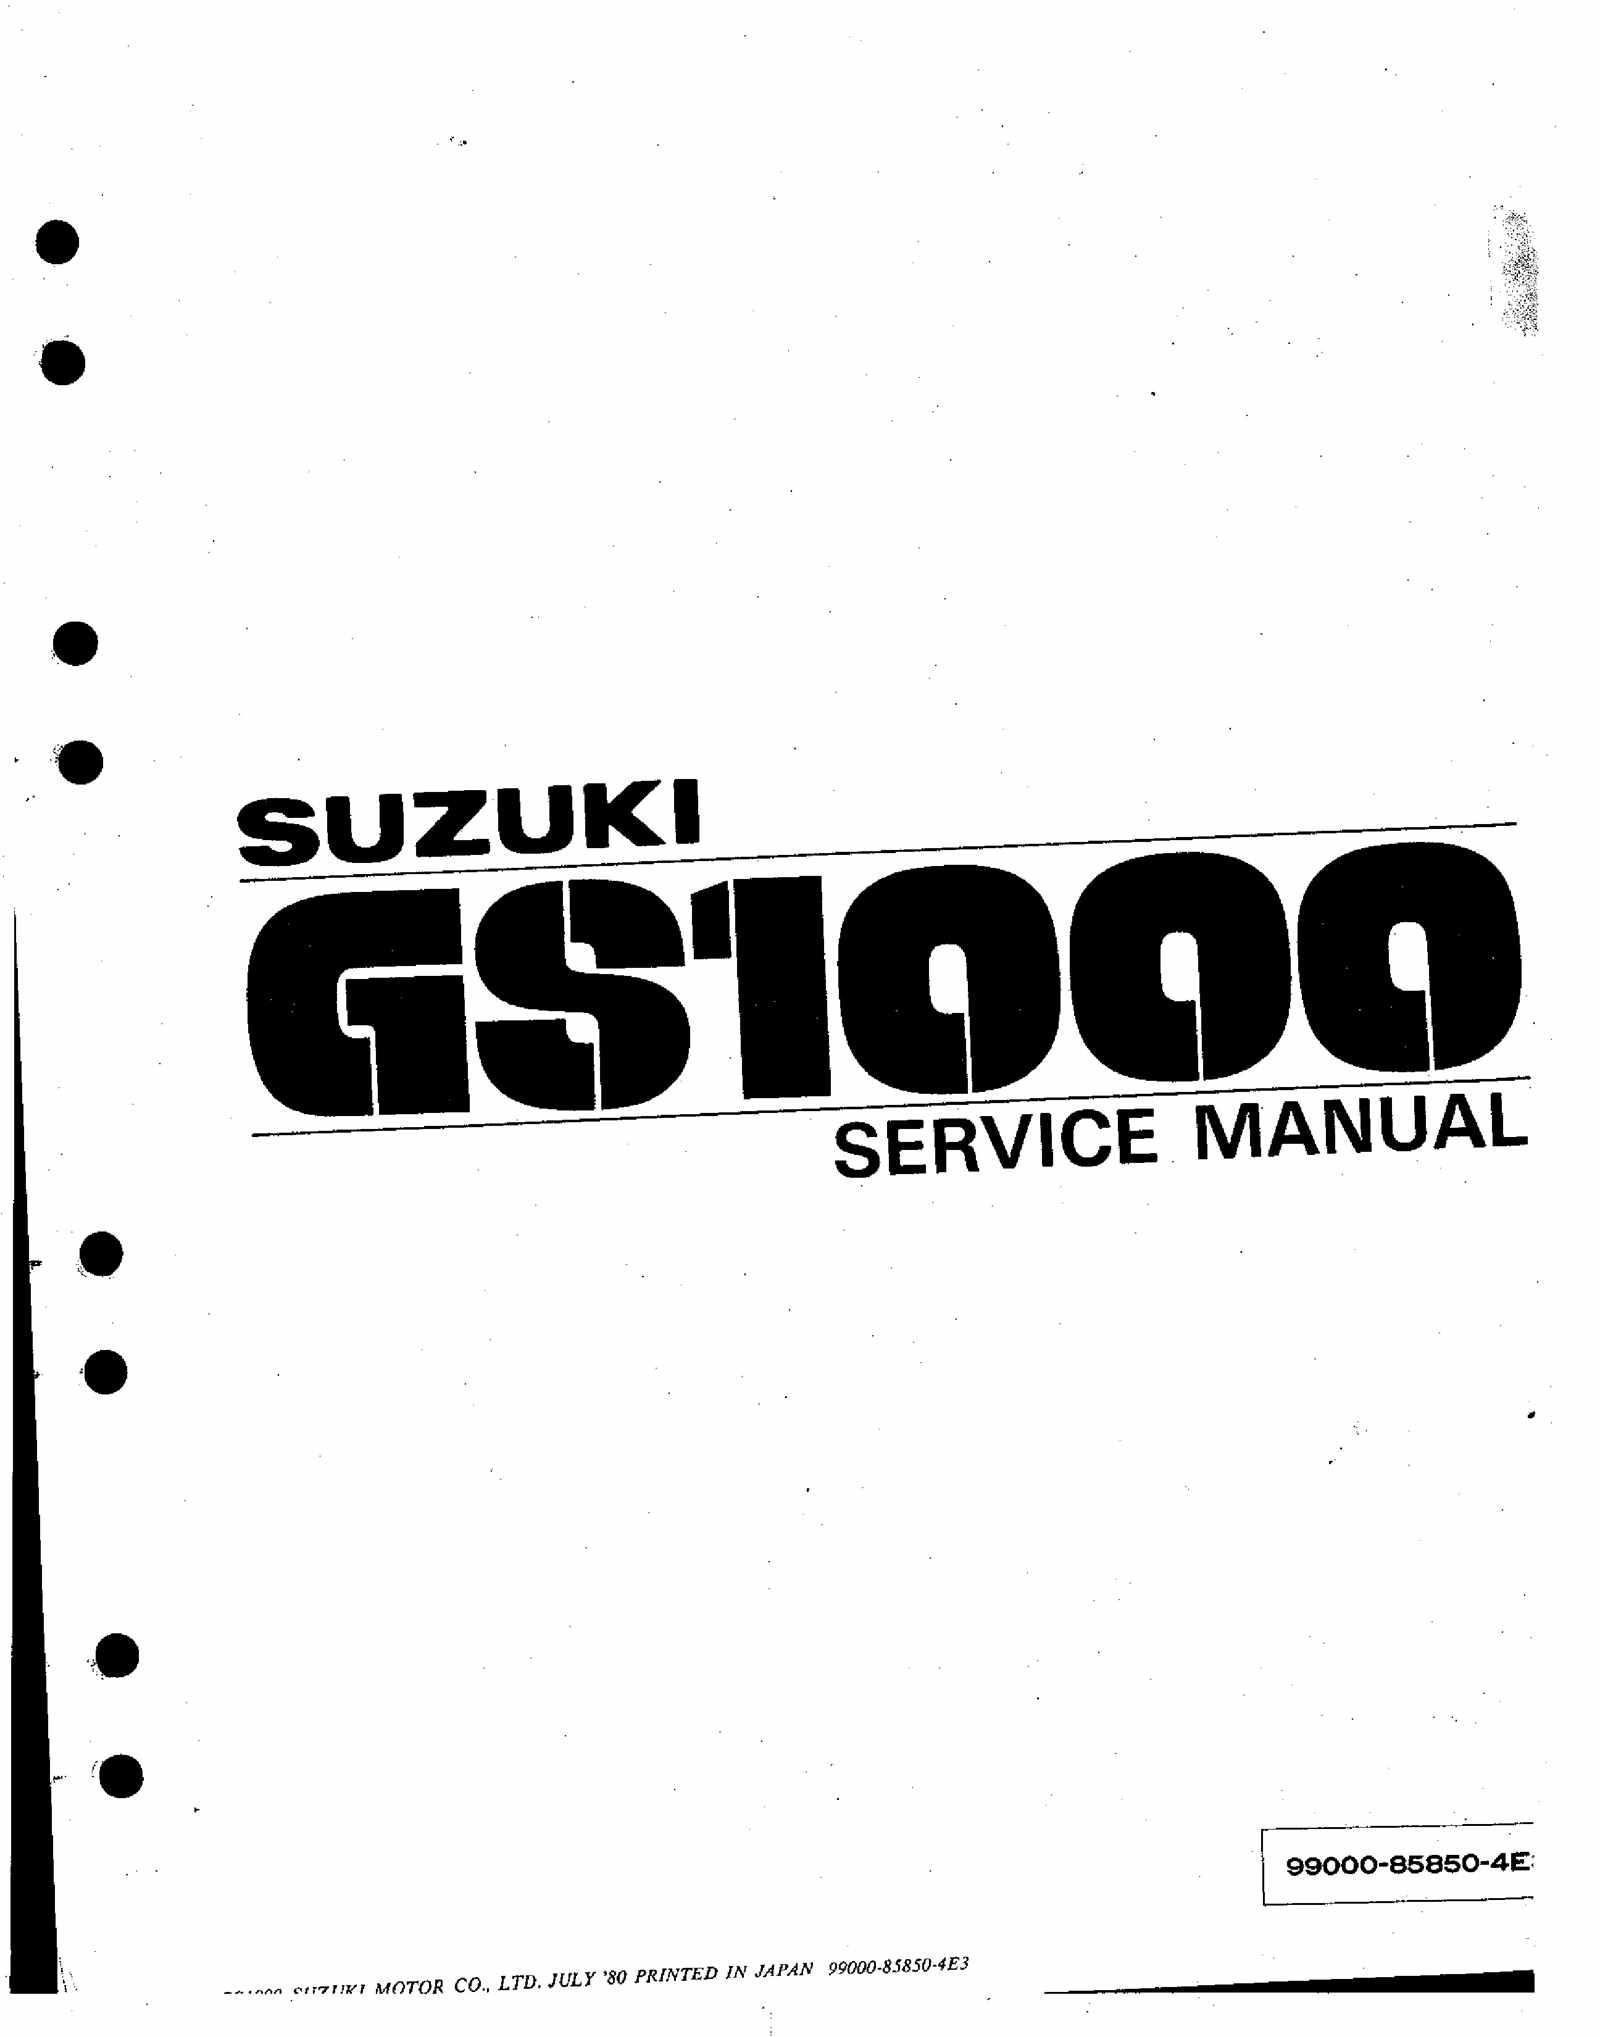 Suzuki GS1000 1980 Service Manual Free Download